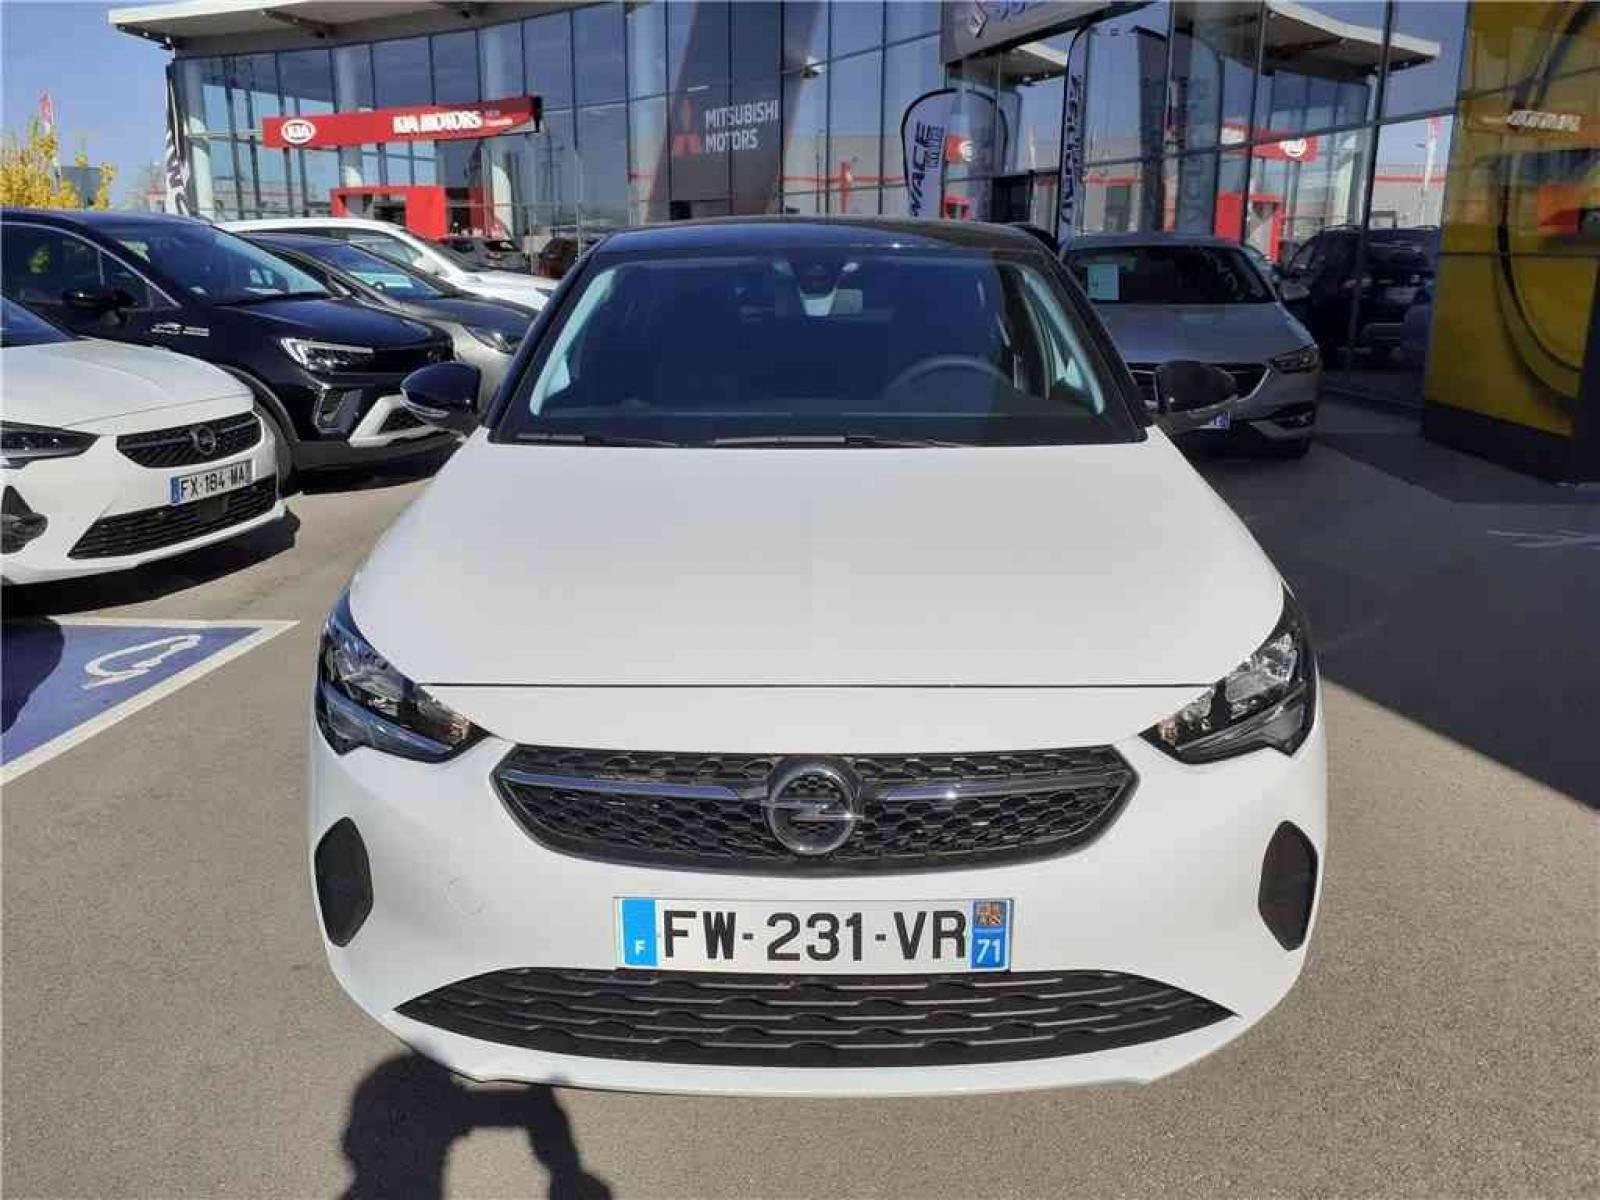 OPEL Corsa 1.2 Turbo 100 ch BVM6 - véhicule d'occasion - Groupe Guillet - Opel Magicauto - Chalon-sur-Saône - 71380 - Saint-Marcel - 2